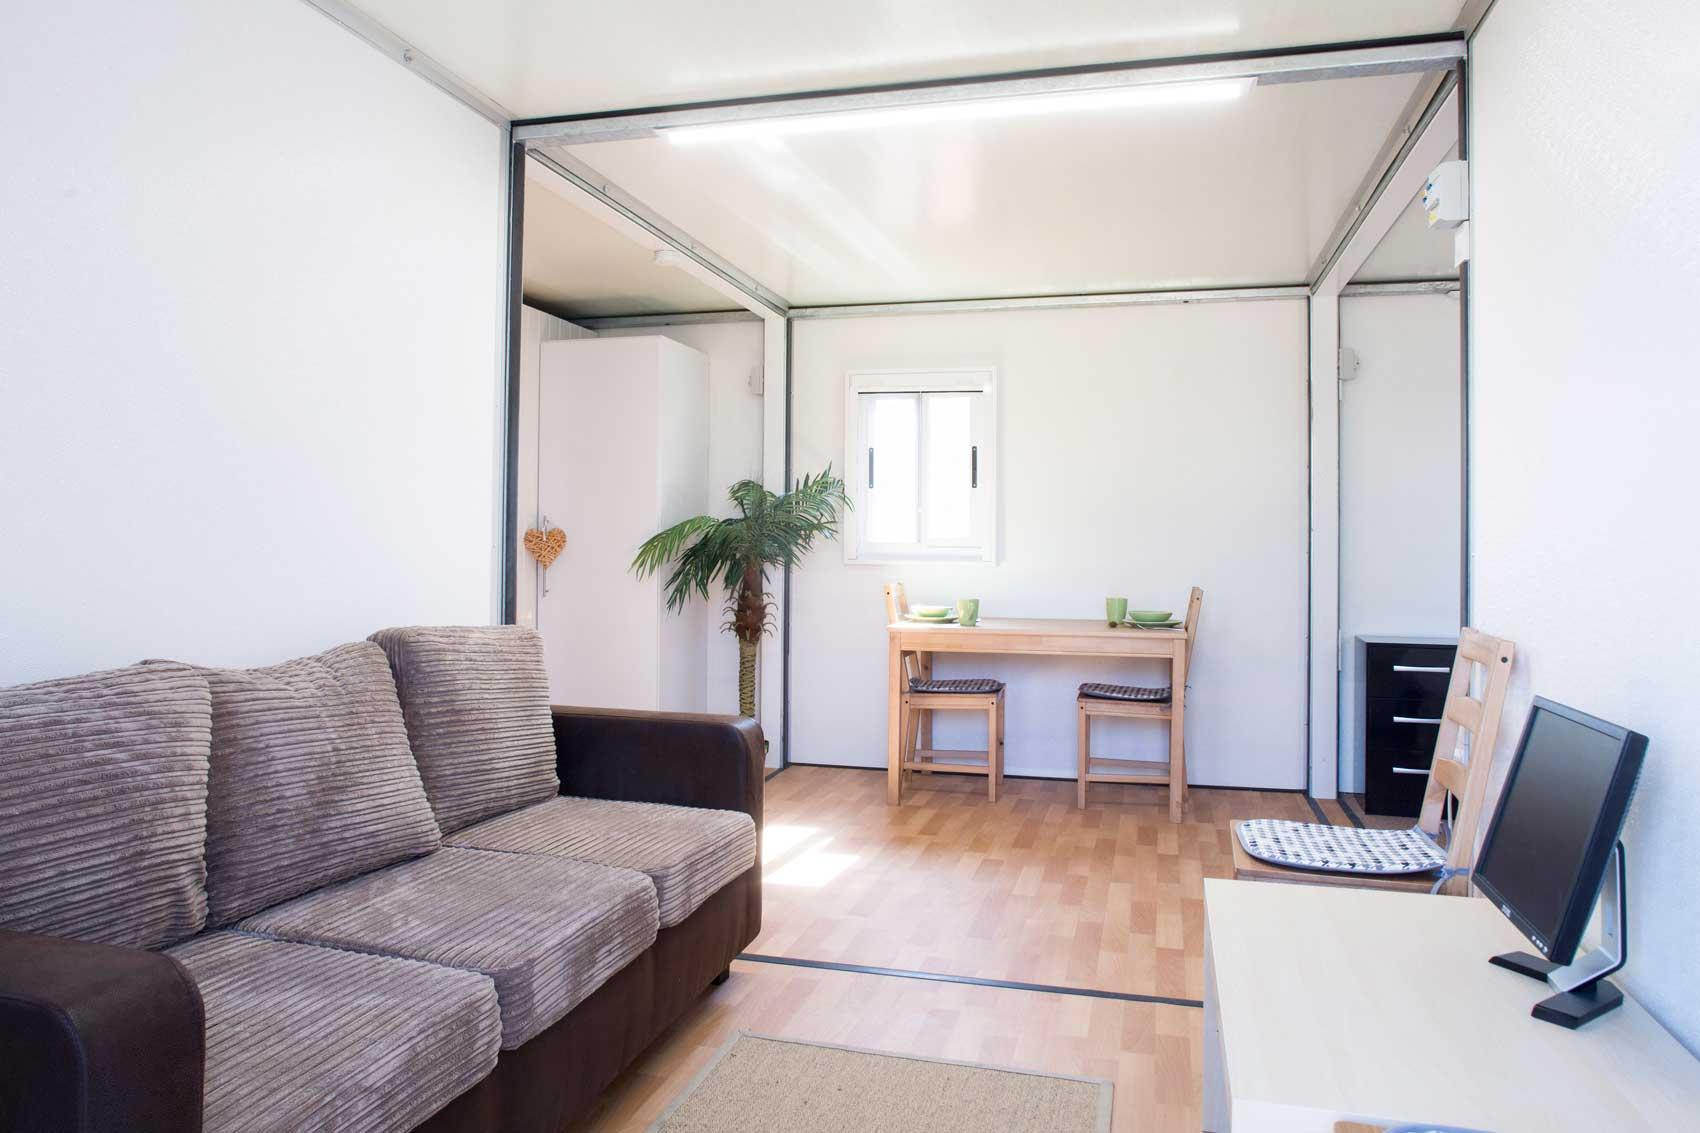 Cocoon Project Kudos Modular Housing 10.jpg